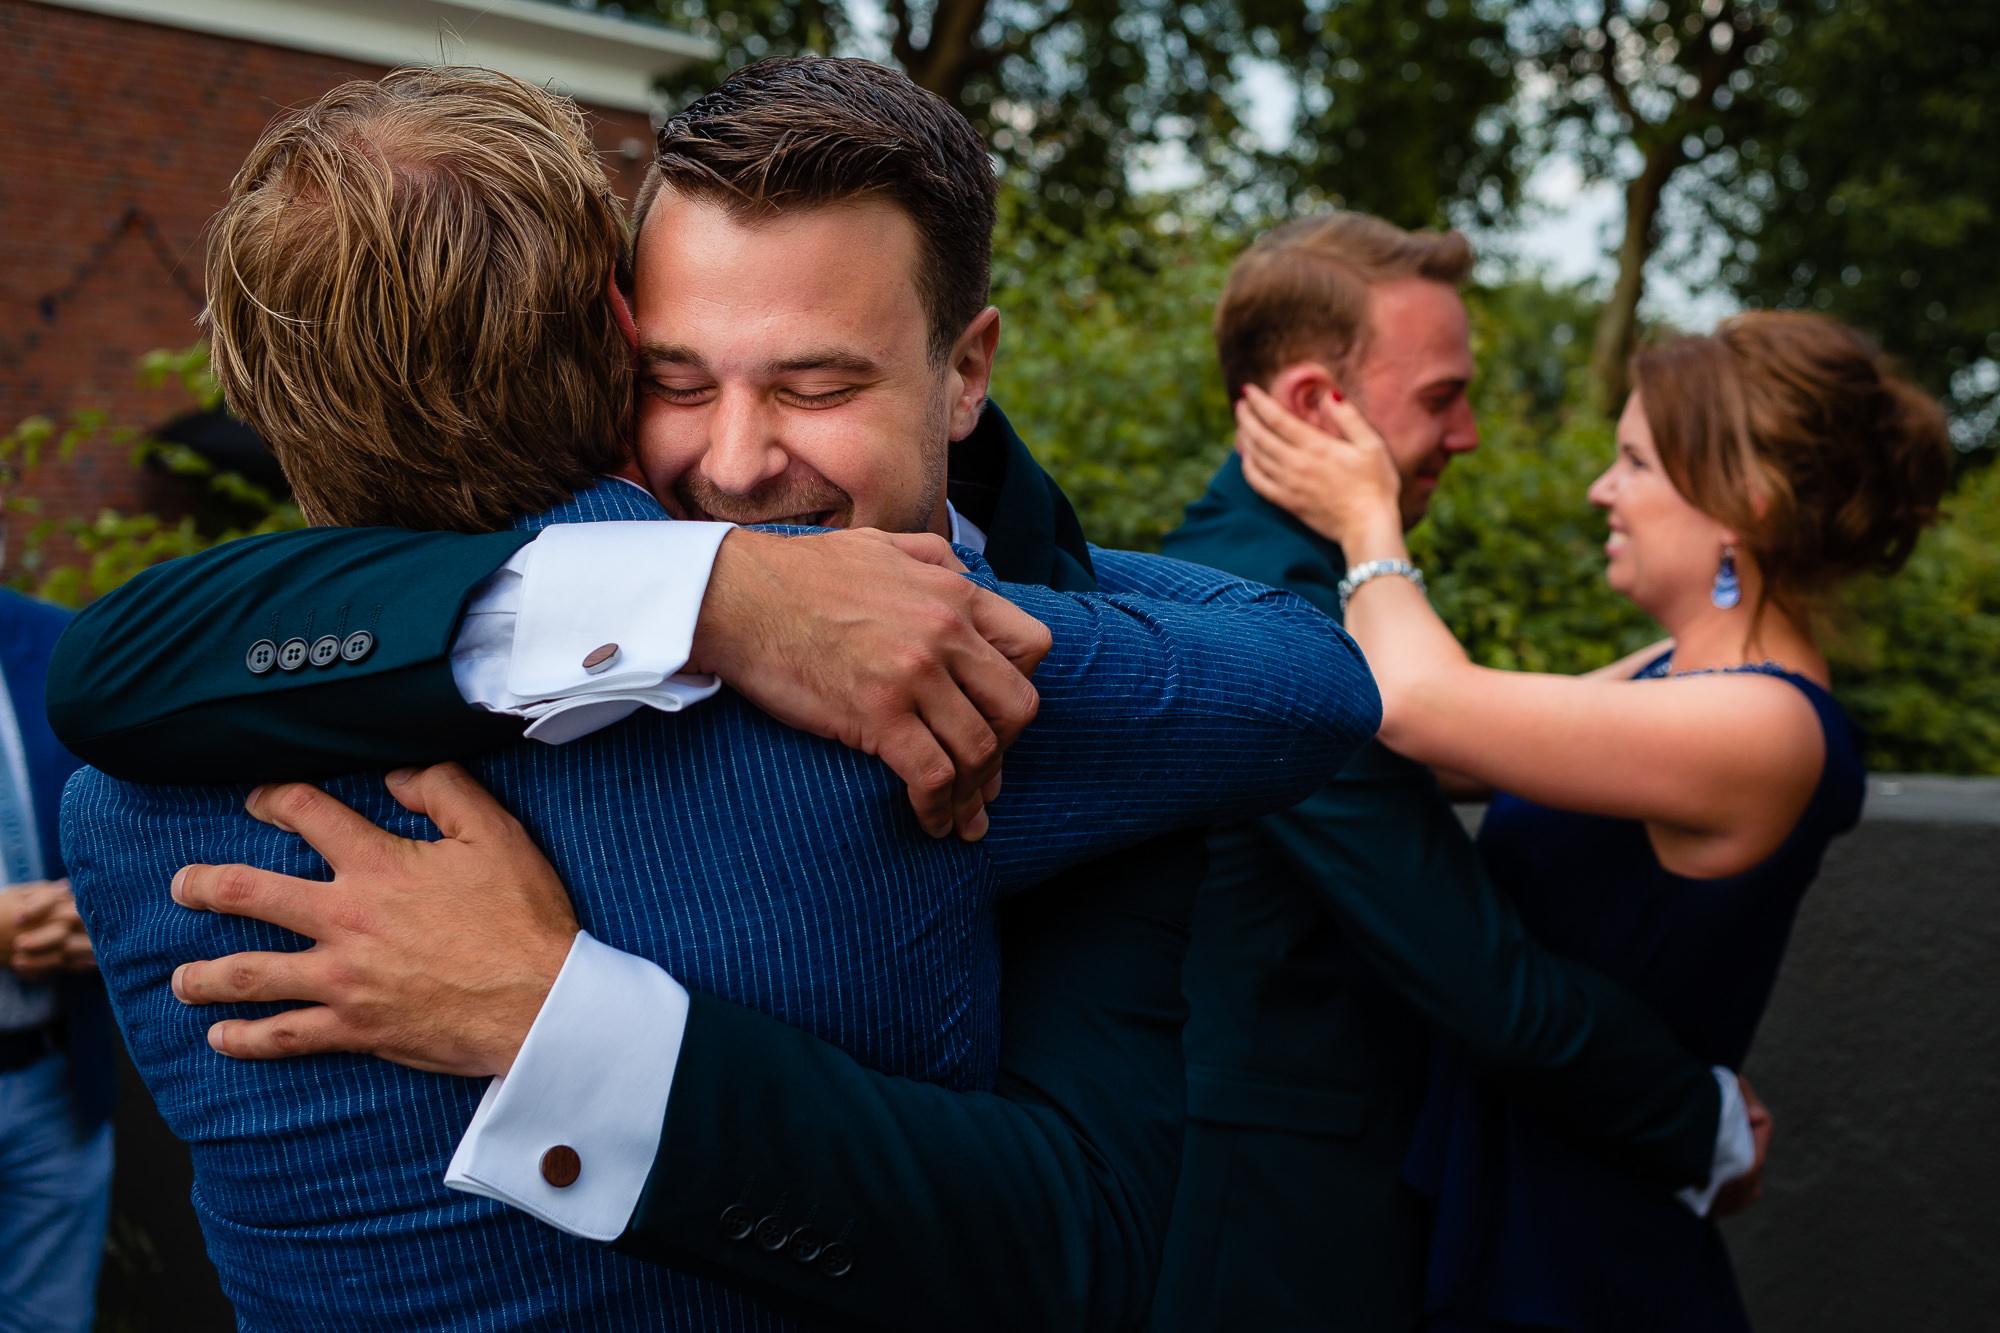 Bruidegommen worden beiden geëmotioneerd geknuffeld